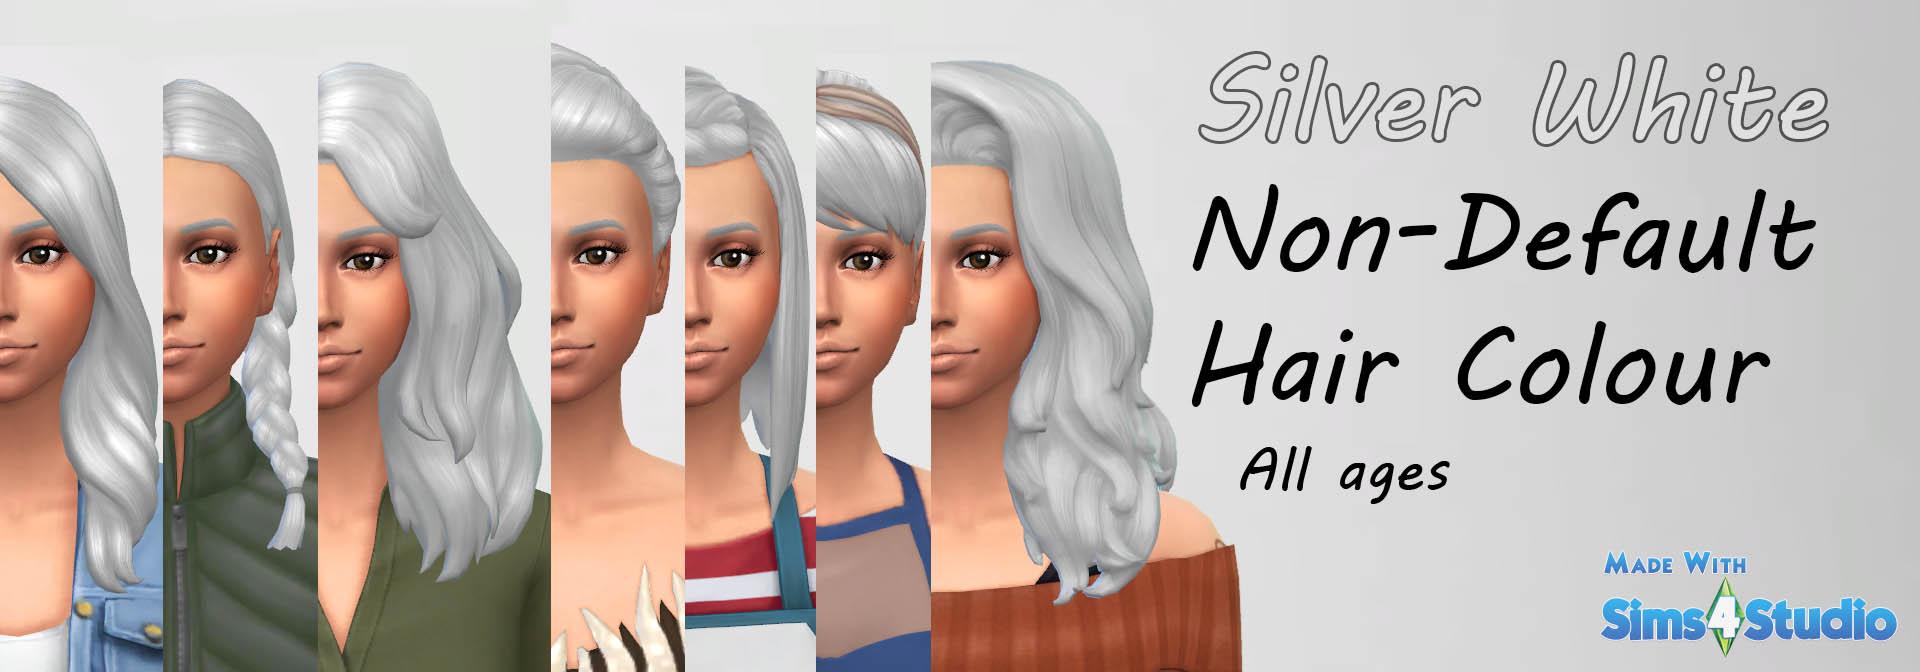 Mod The Sims Silver White Hair Colour Non Default